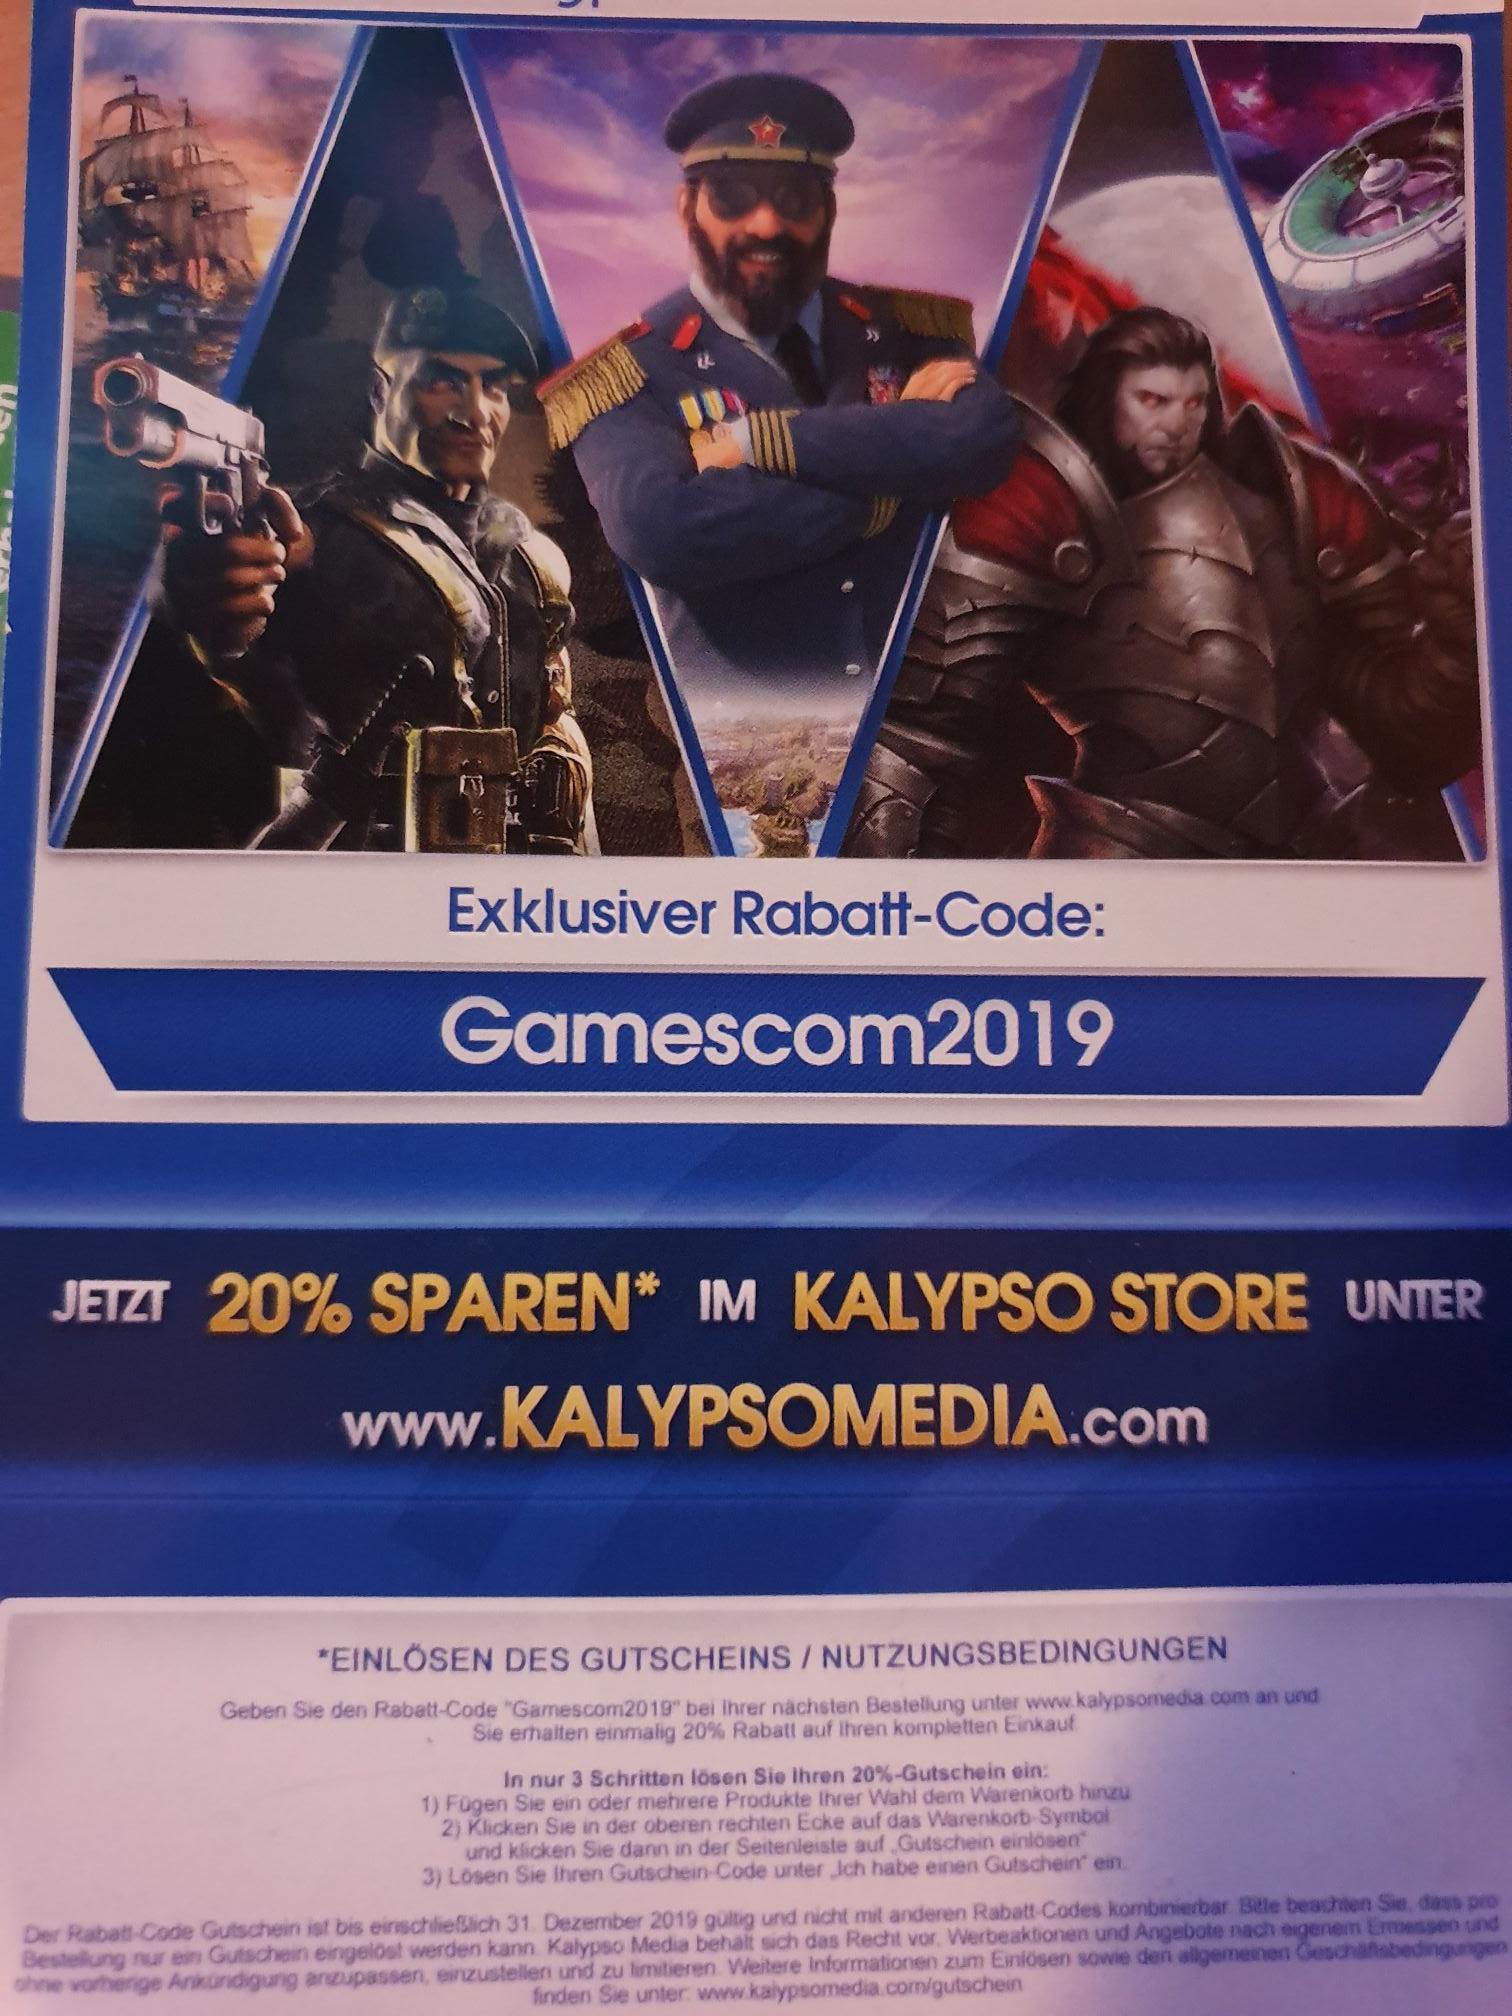 20% korting bij Kalypso